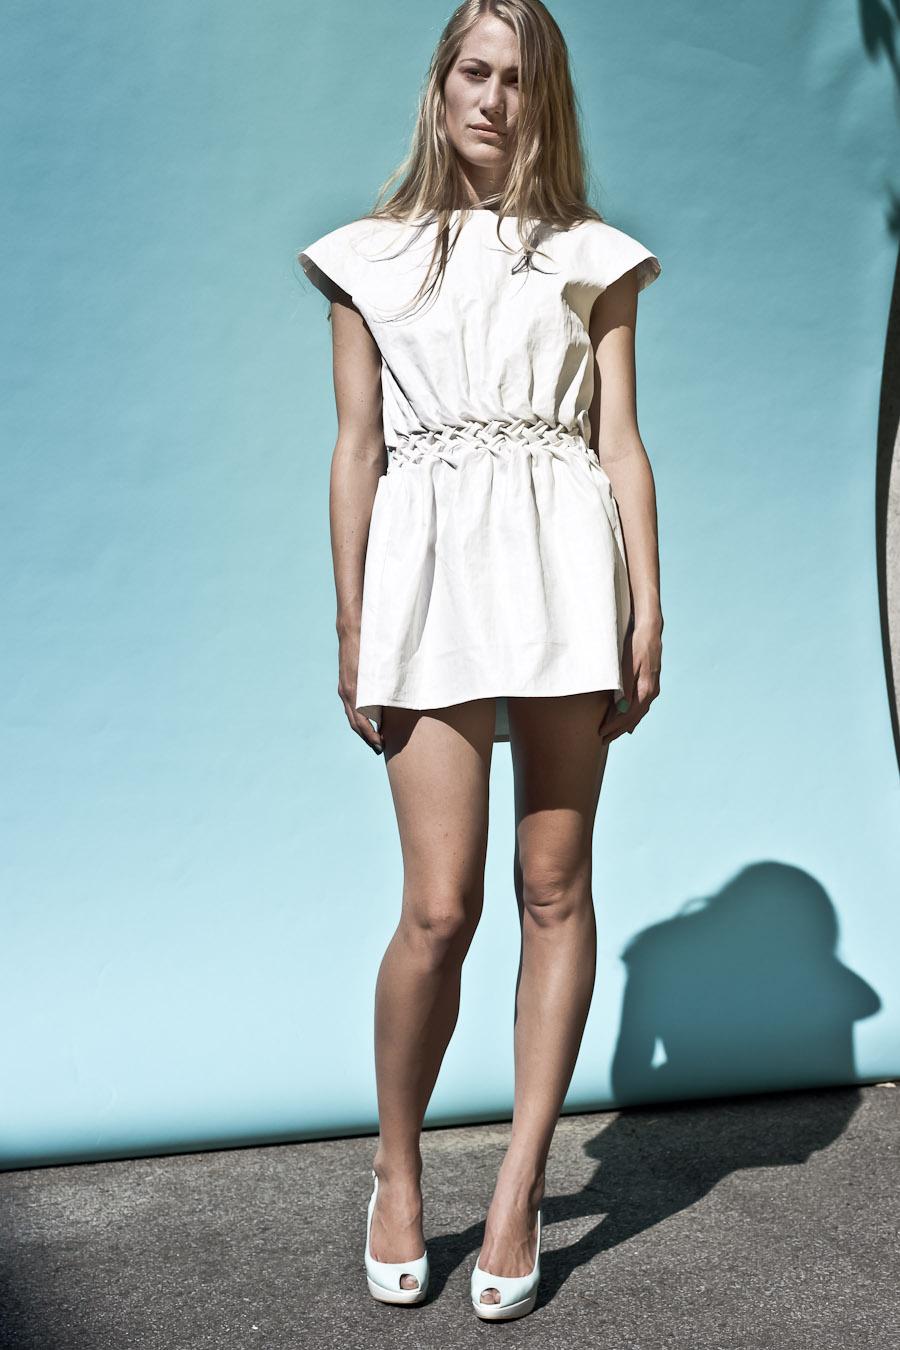 dress: Sardonyx